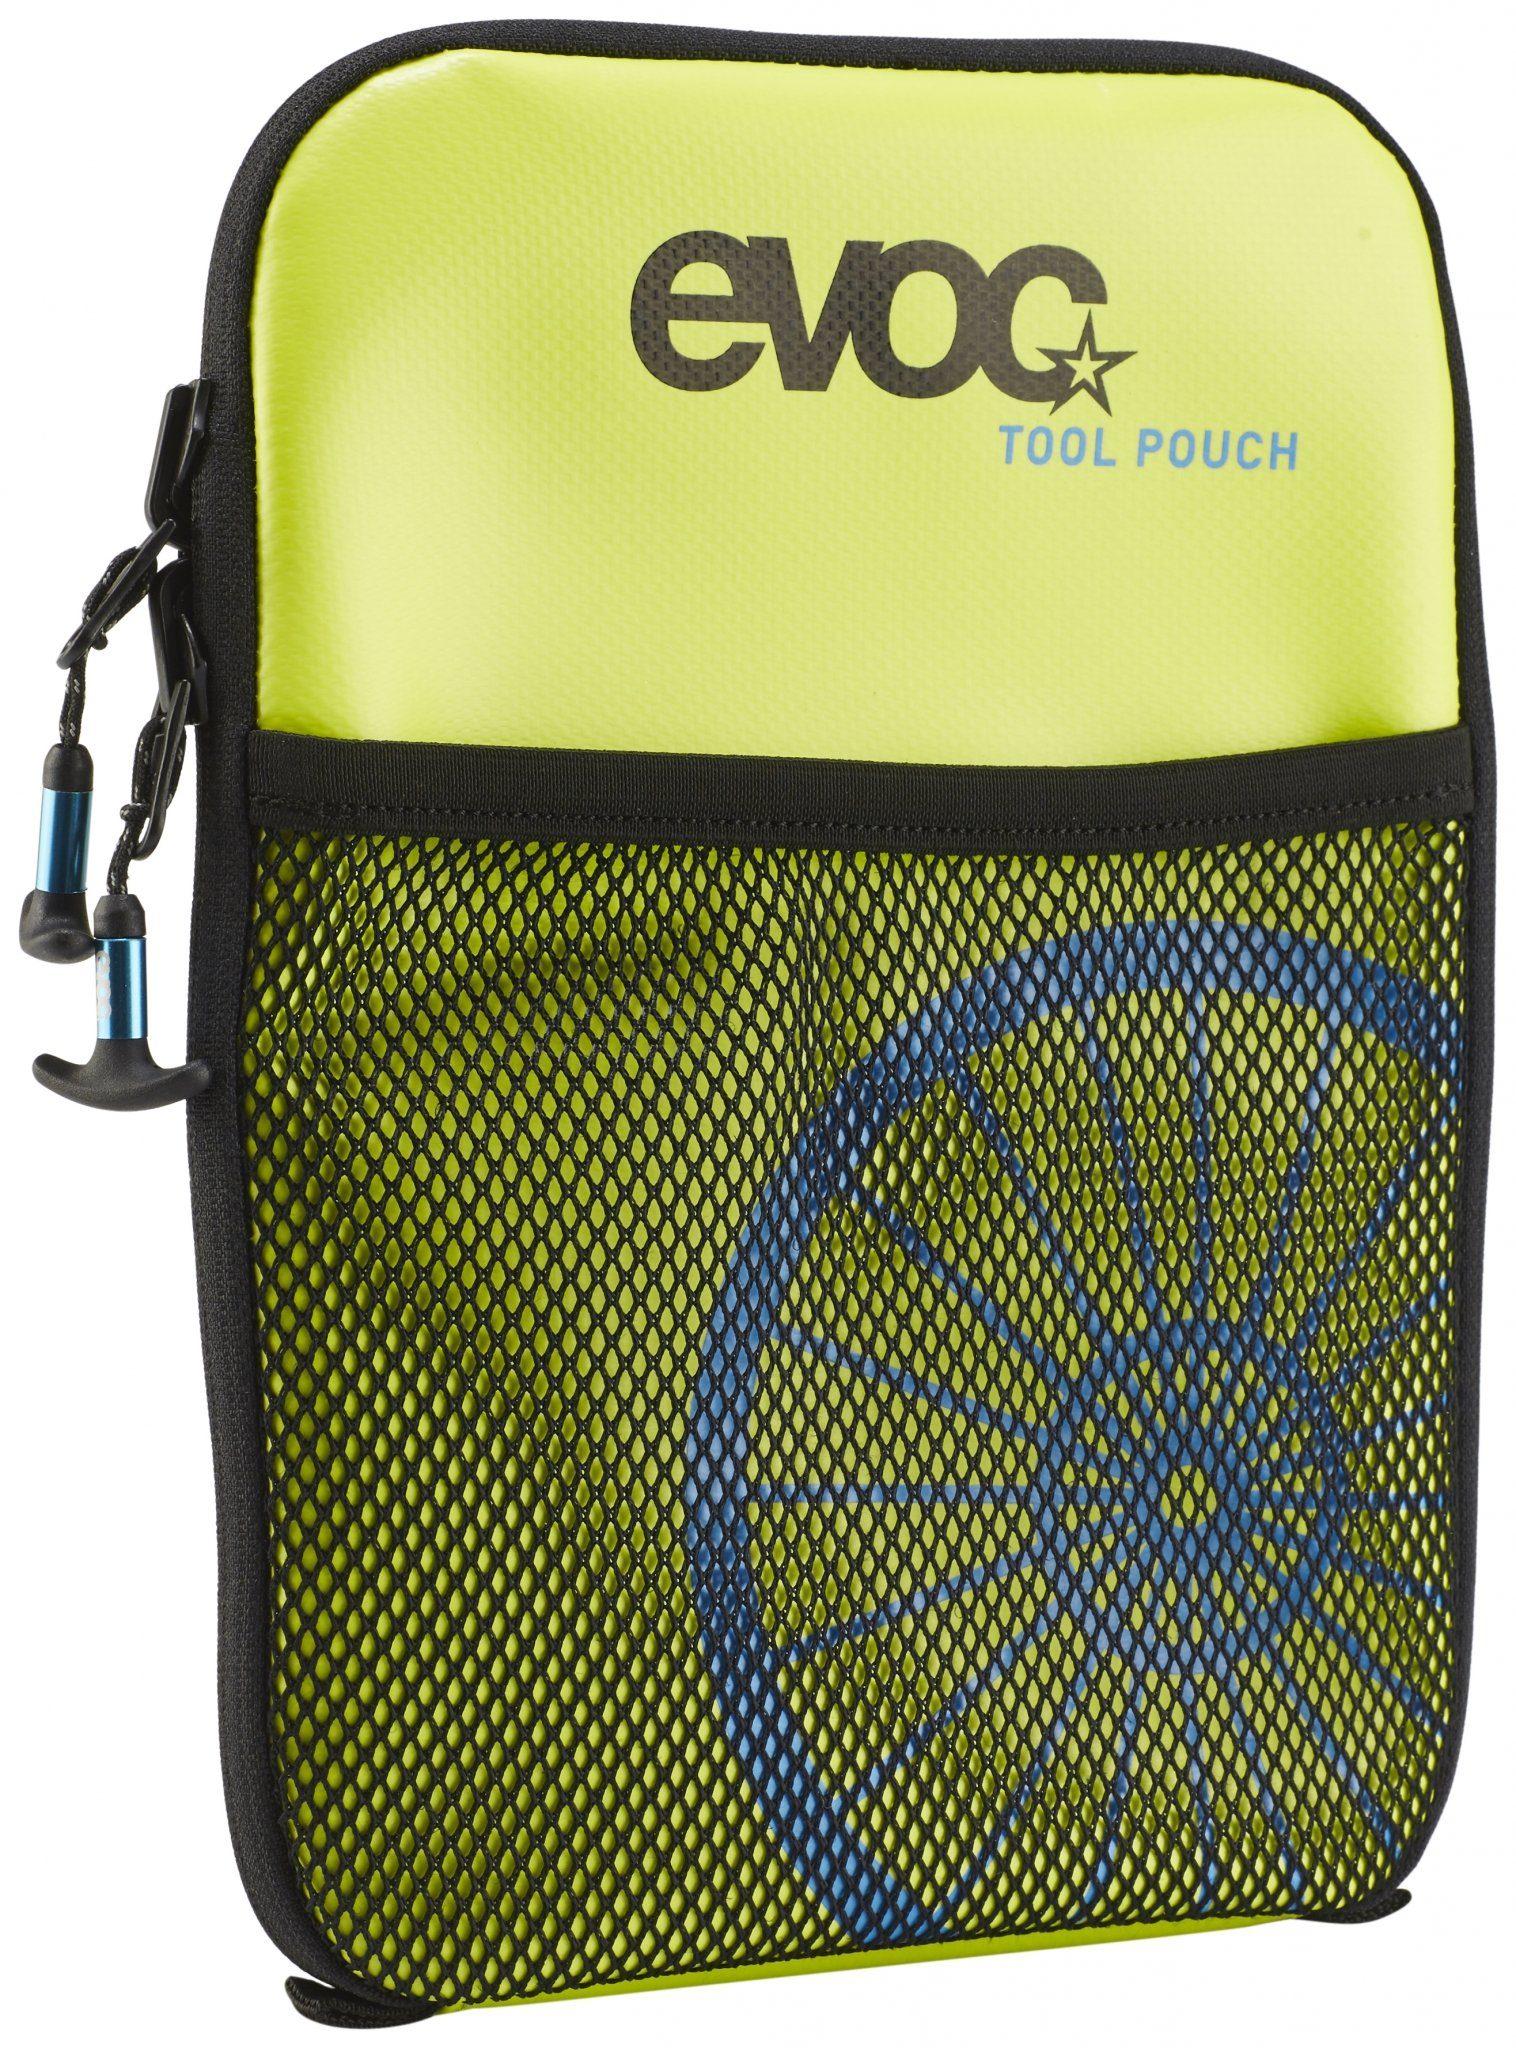 Evoc Fahrradtasche »Toul Pouch Werkzeugtasche«